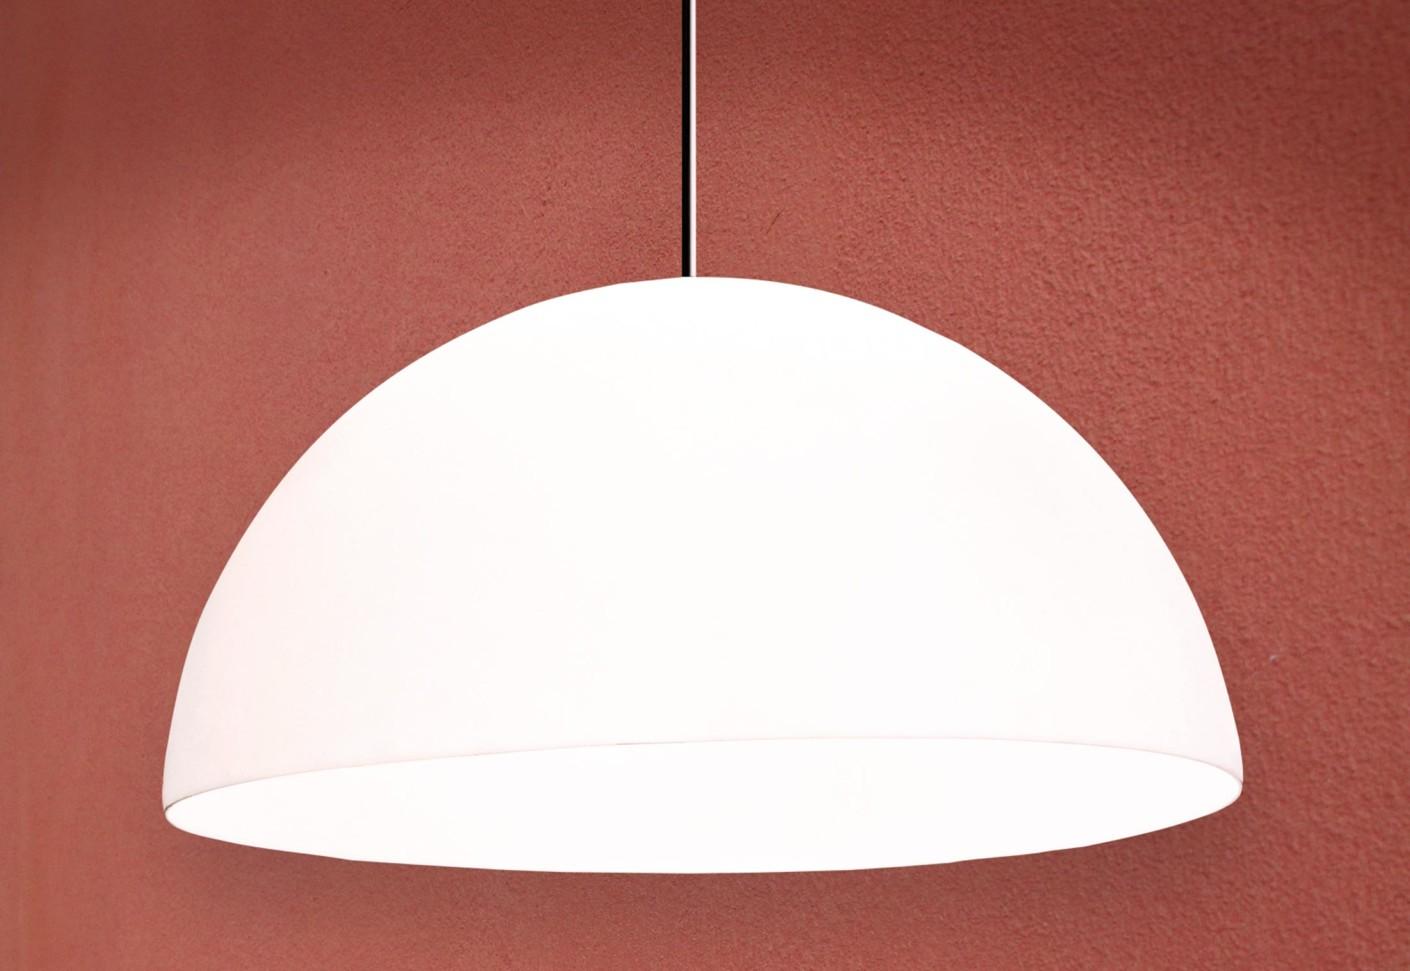 avico outdoor lamp by fontanaarte stylepark. Black Bedroom Furniture Sets. Home Design Ideas